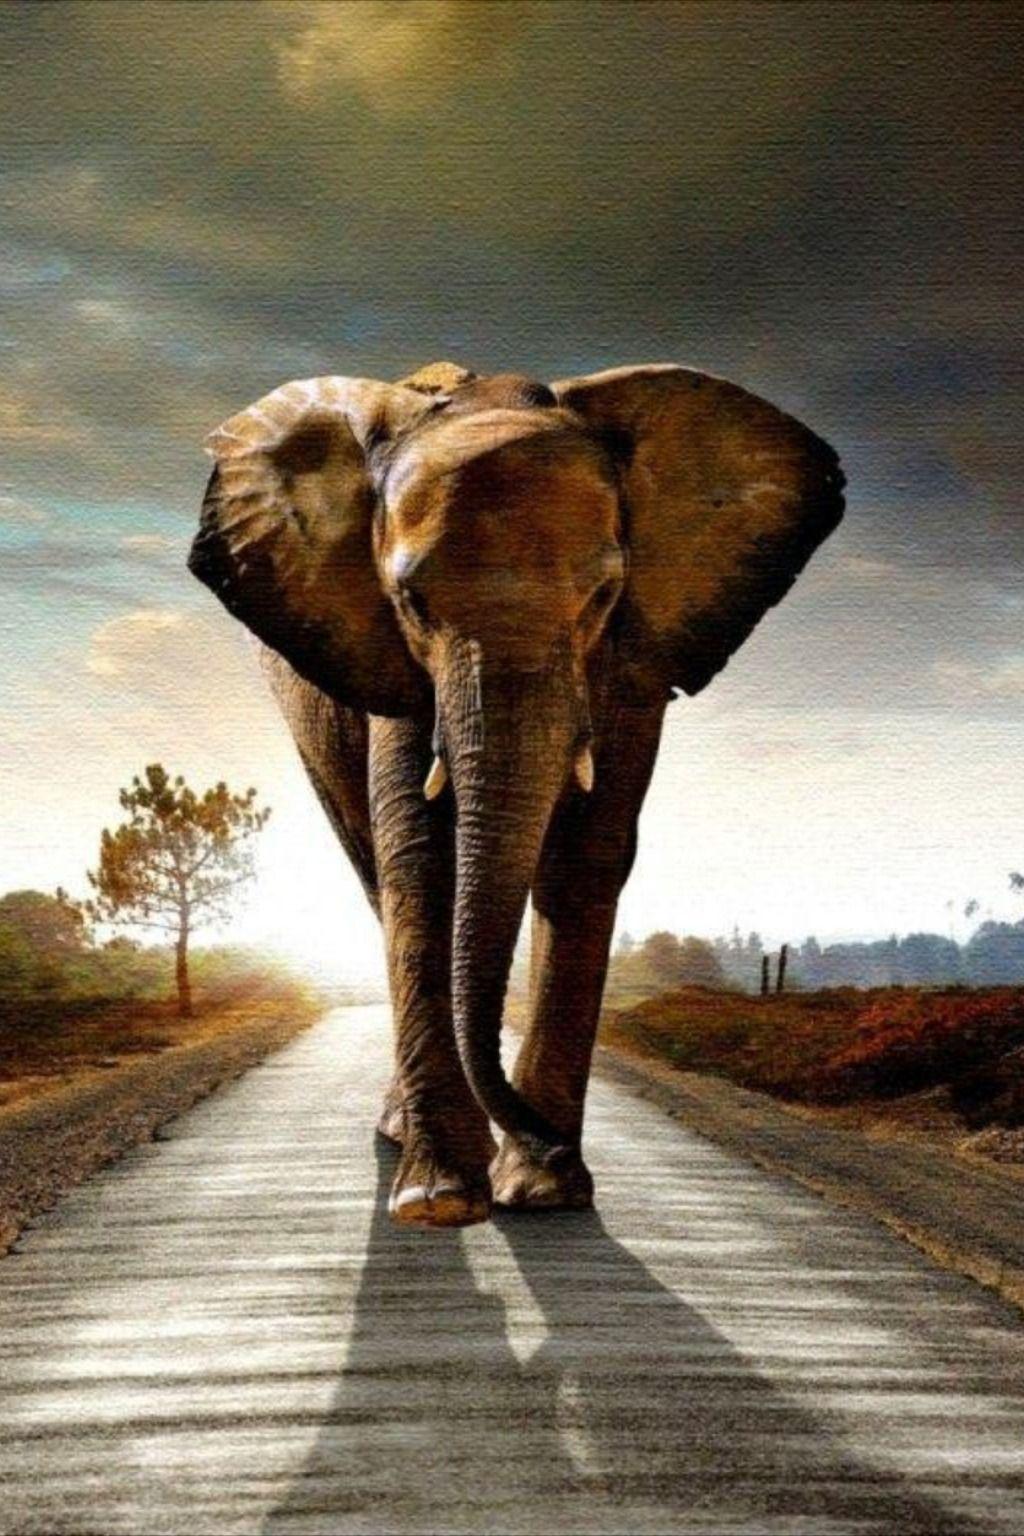 Elephant Wallpapers Elephant Iphone Wallpaper Wild Animal Wallpaper Elephant Wallpaper